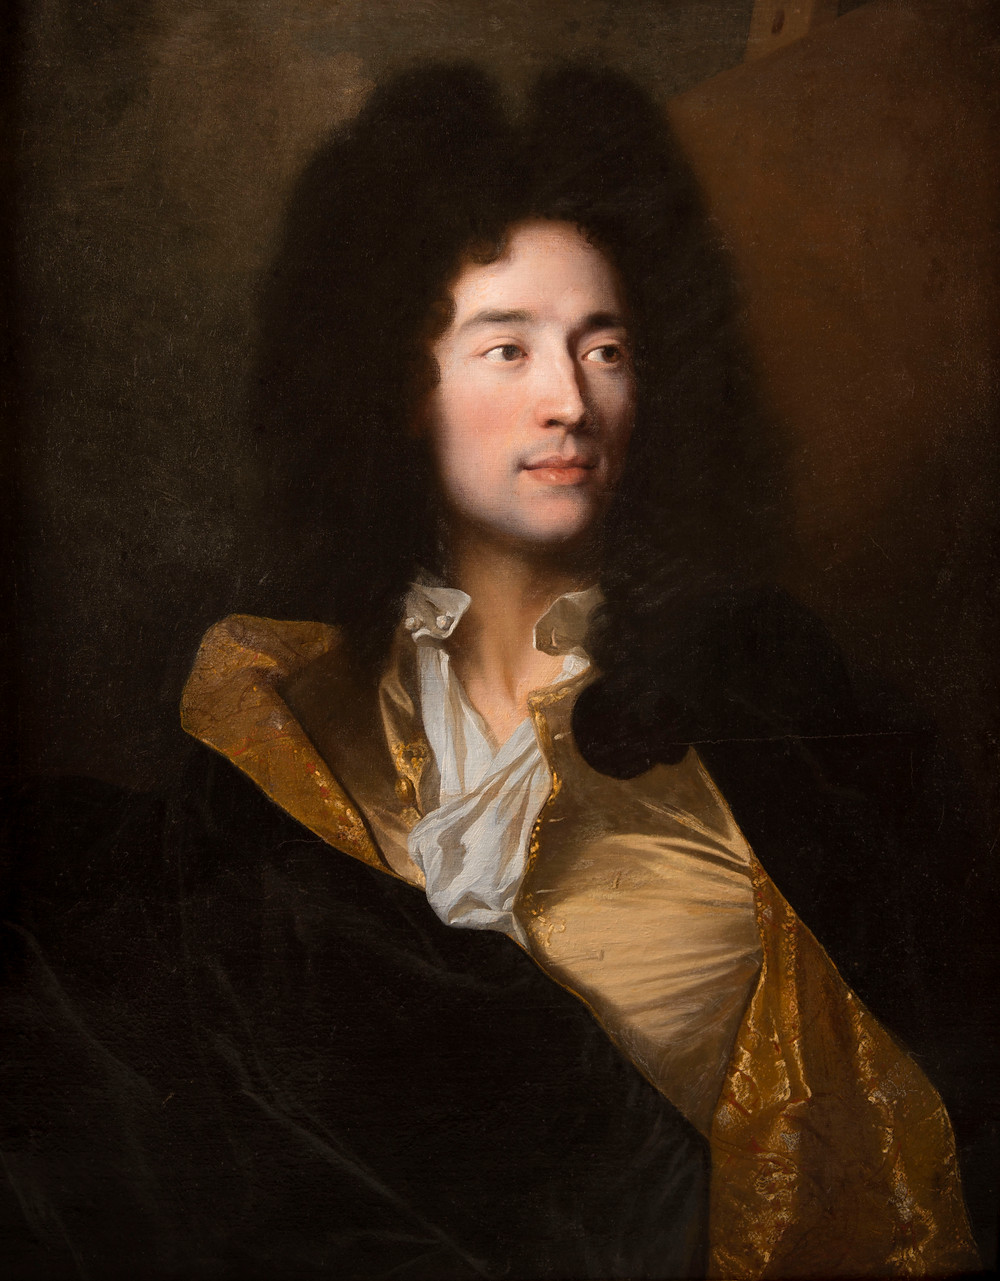 Hyacinthe Rigaud, Portrait de Gaspard Rigaud, 1691, Perpignan, musée Rigaud, inv. 2017.1.1